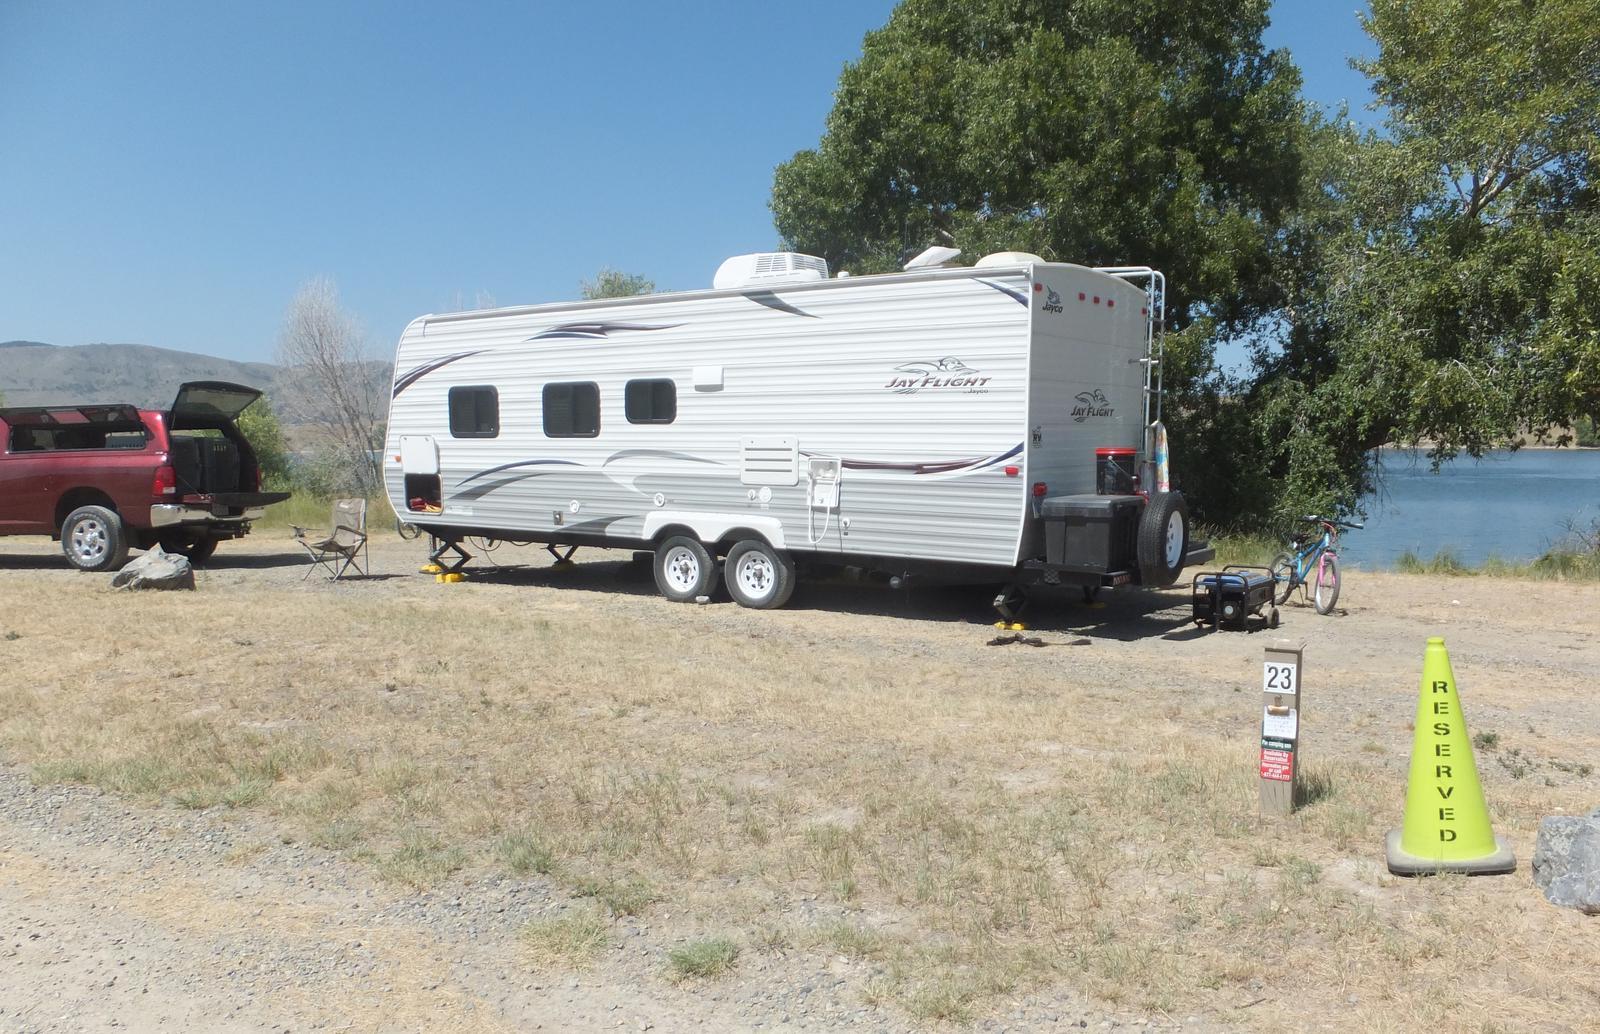 Hellgate Campground - Campsite 23